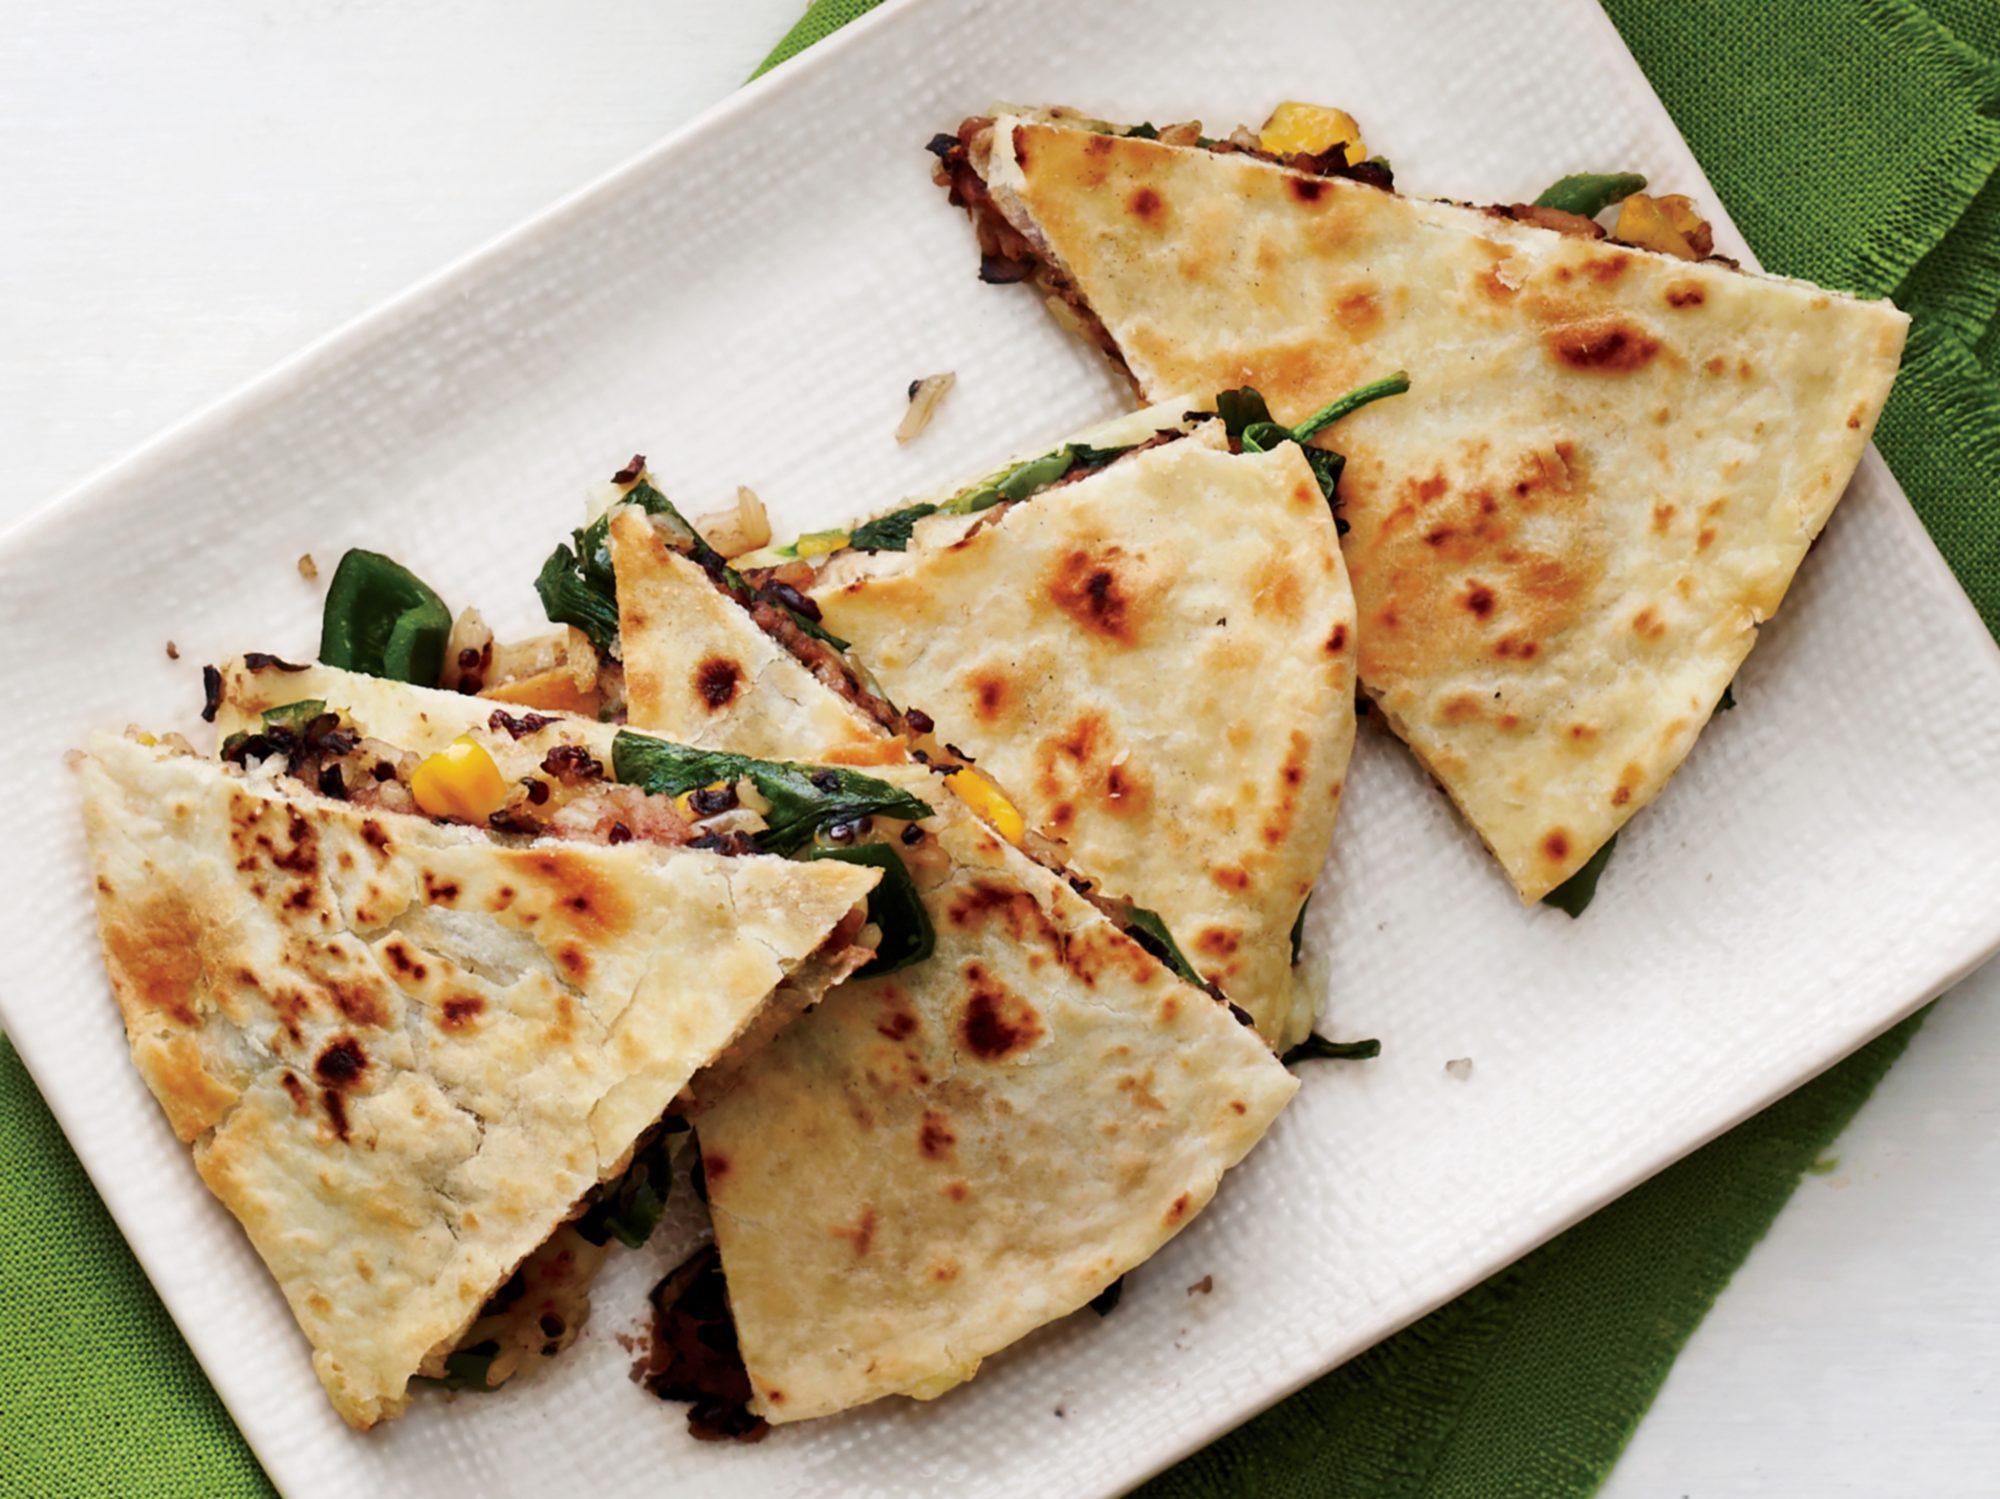 Crispy Vegetable Quesadillas